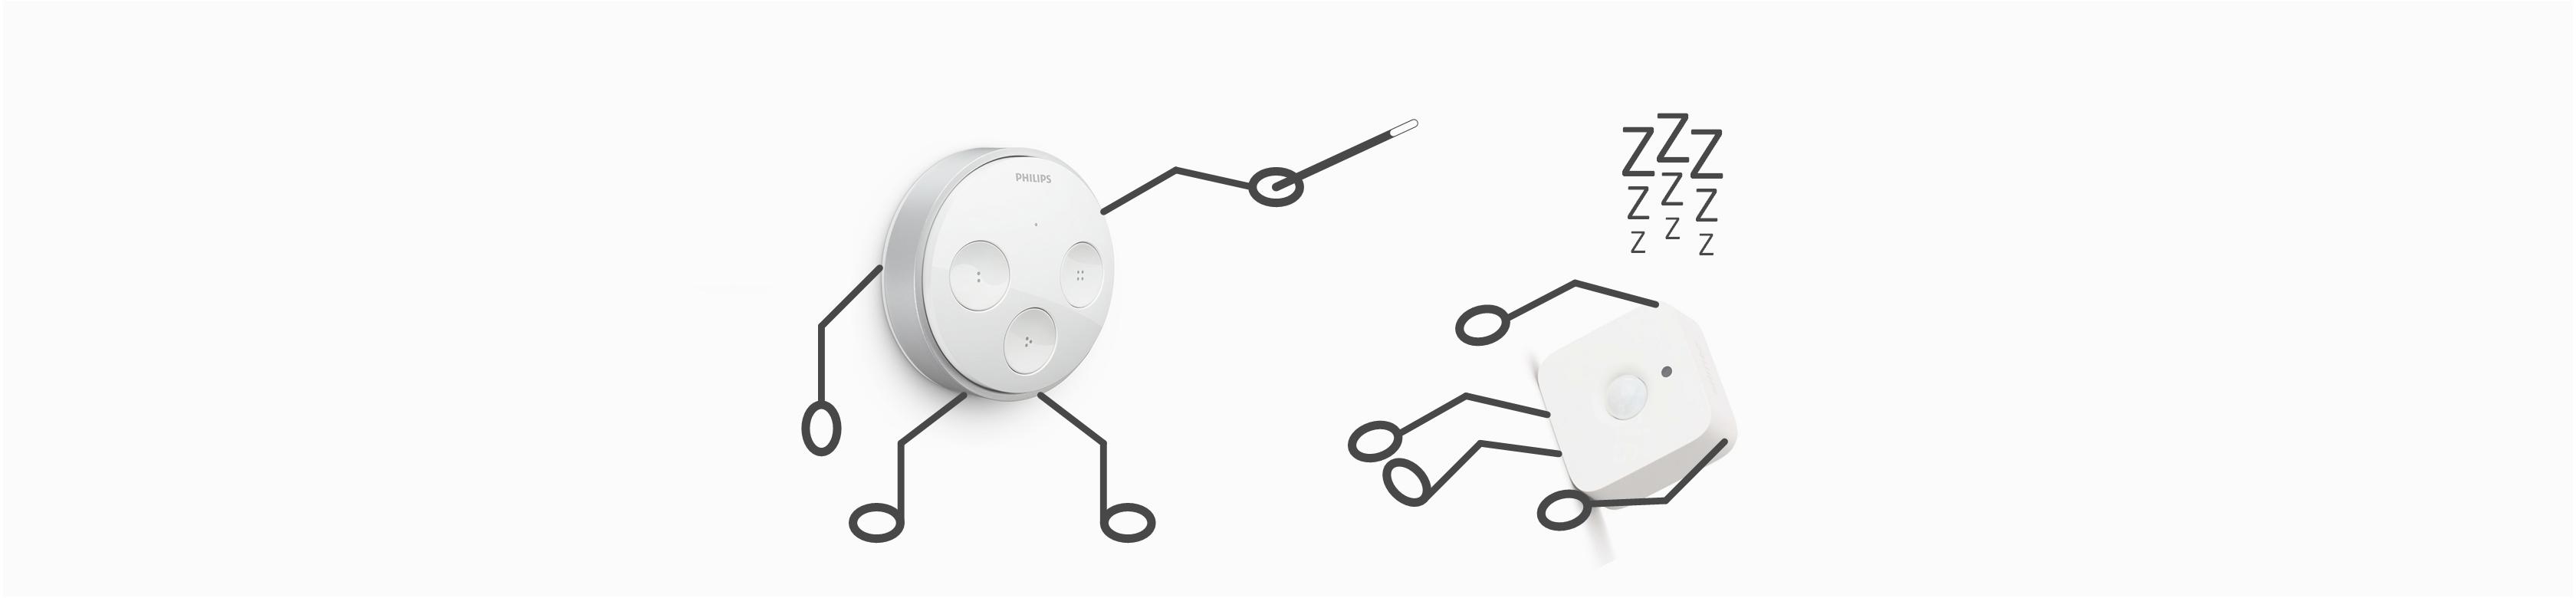 Älyvalot (Smart Lights), Philips Hue, Ikea Trådfri yms.